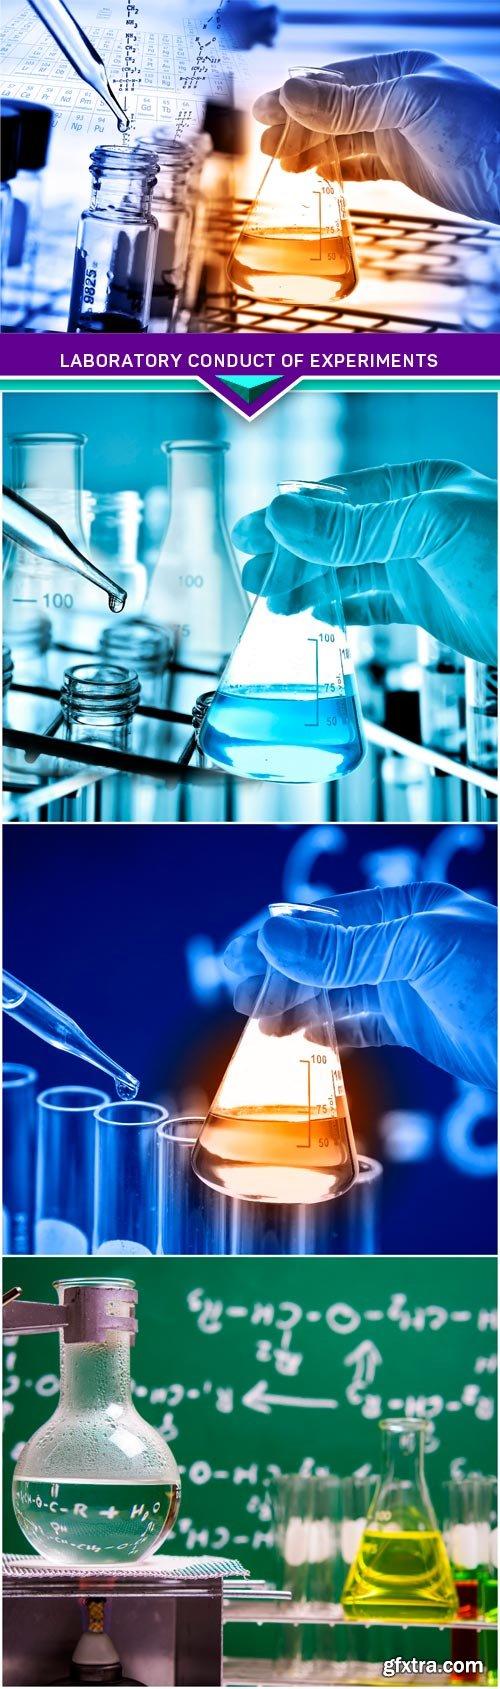 Laboratory conduct of experiments 4x JPEG